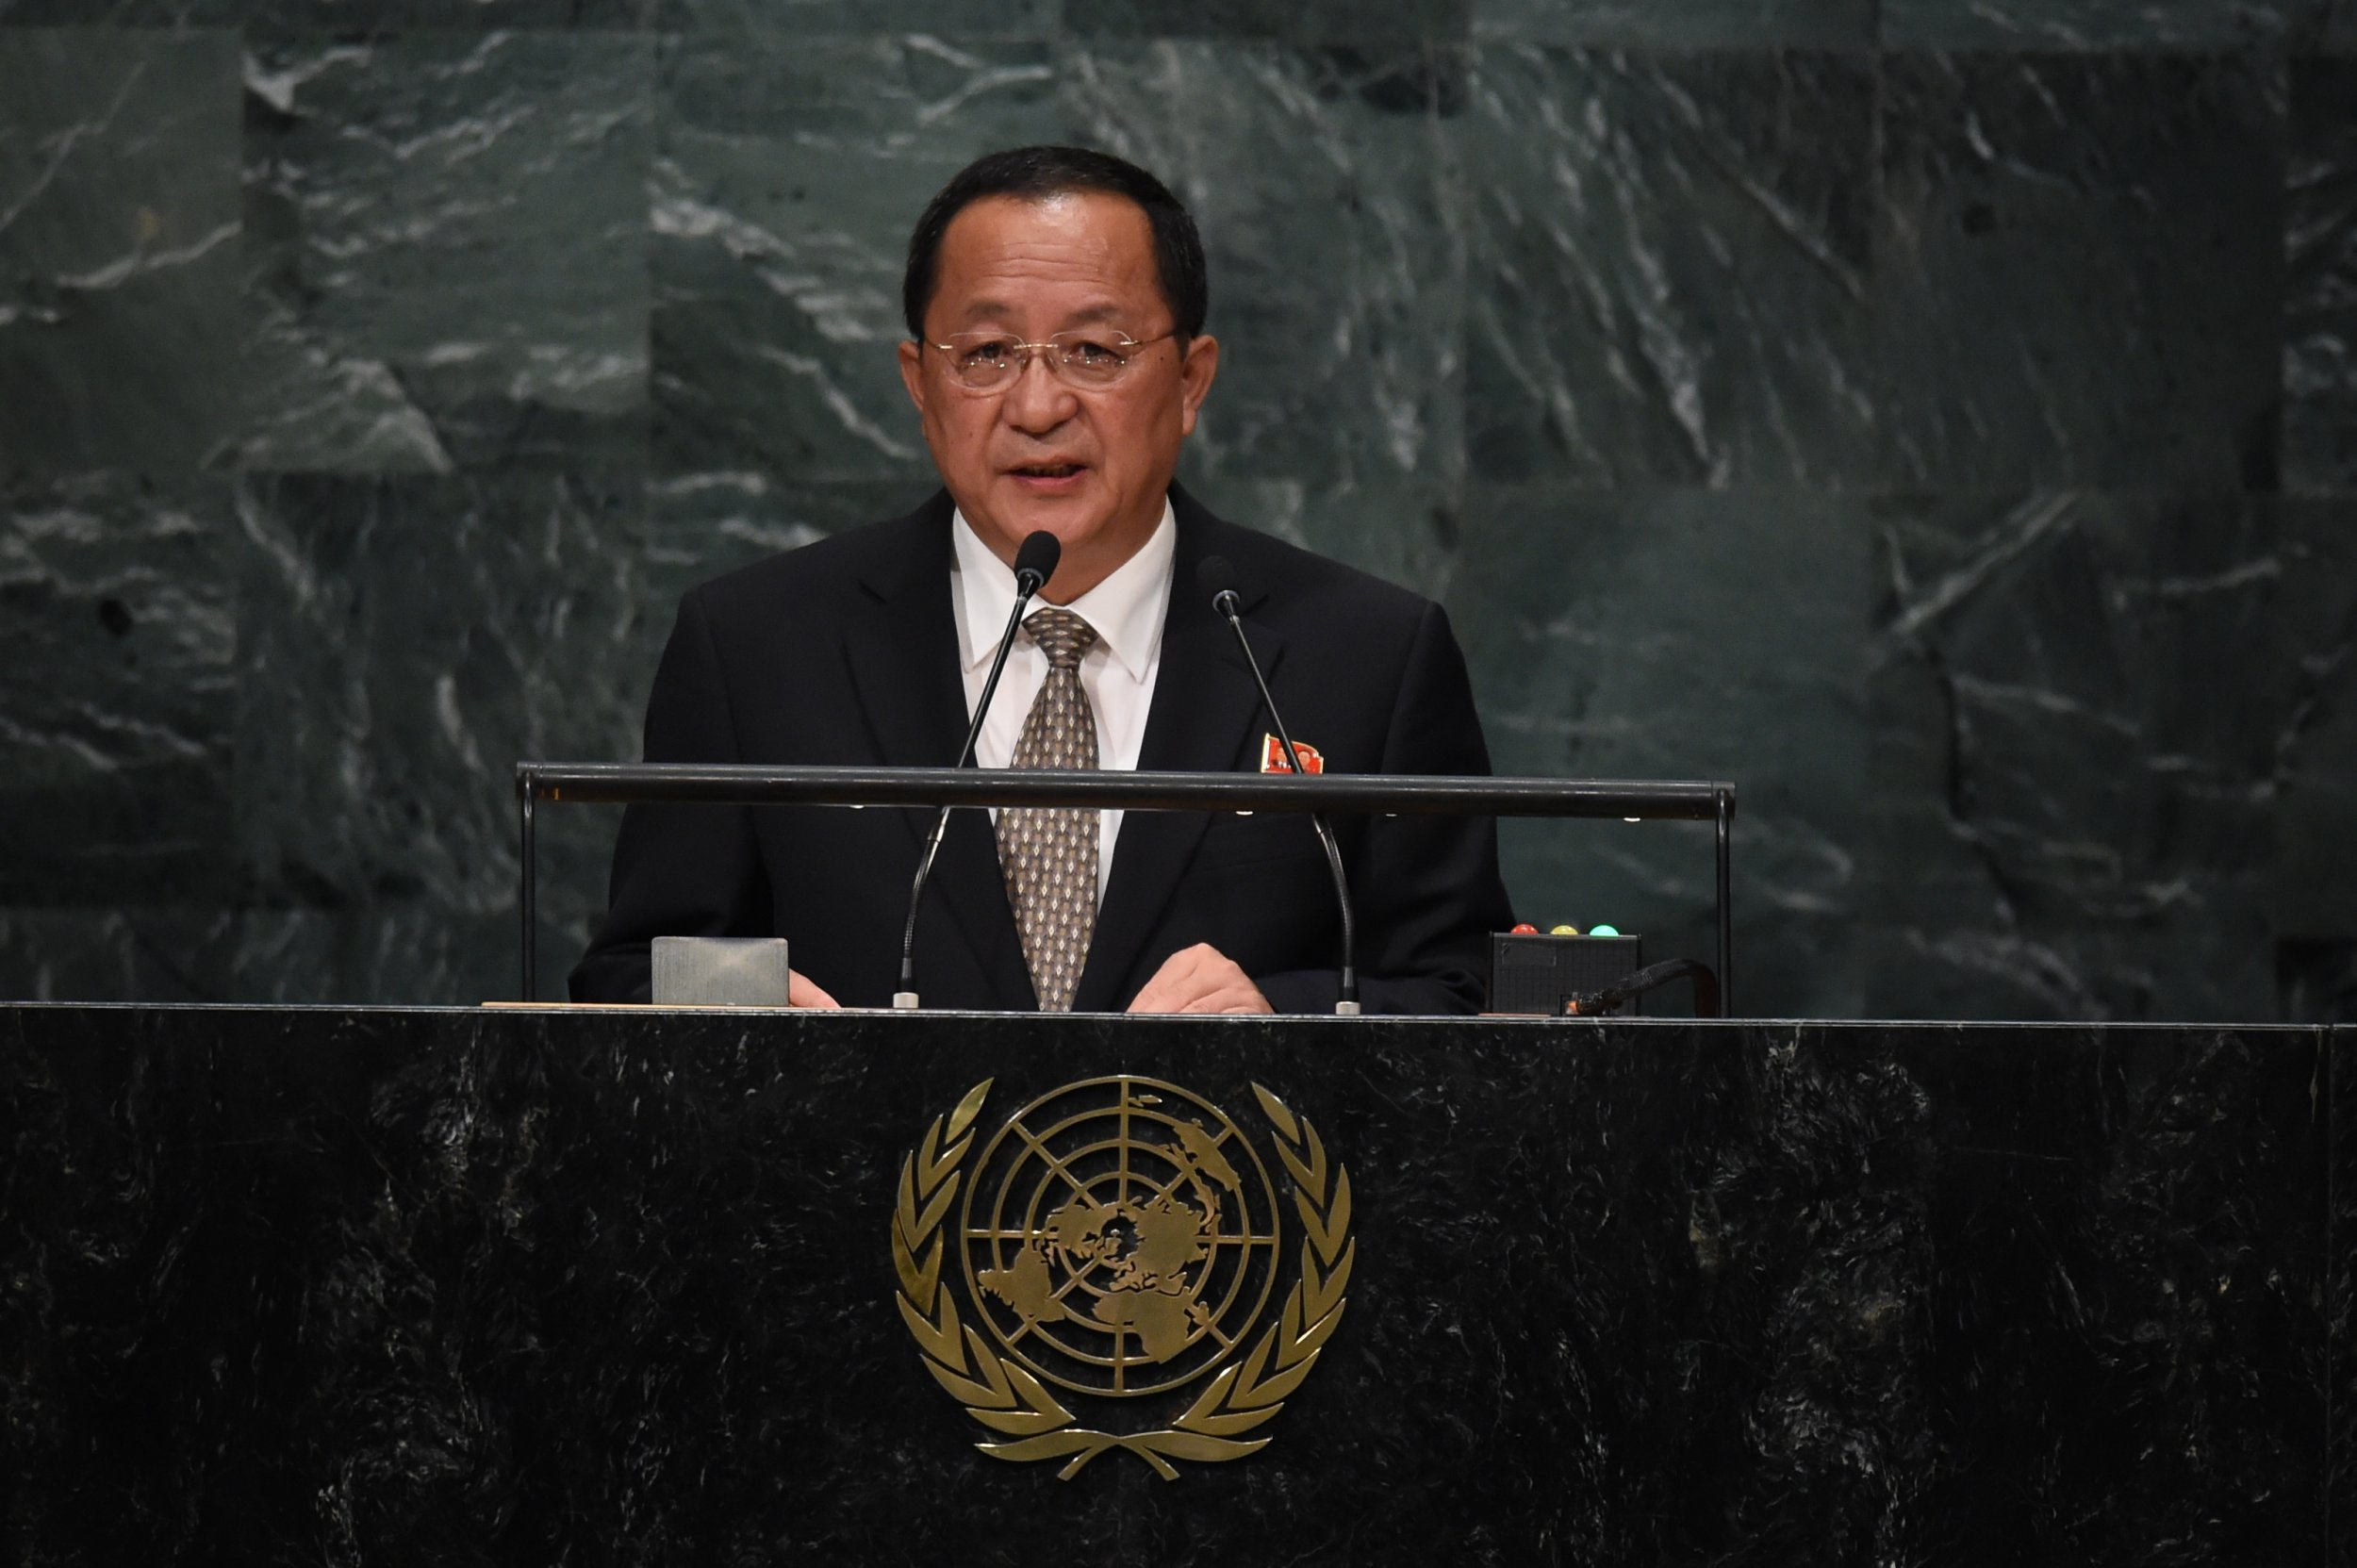 North Korea foreign minister Ri Yong Ho is addressing the U.N. on Kim Jong Un's behalf